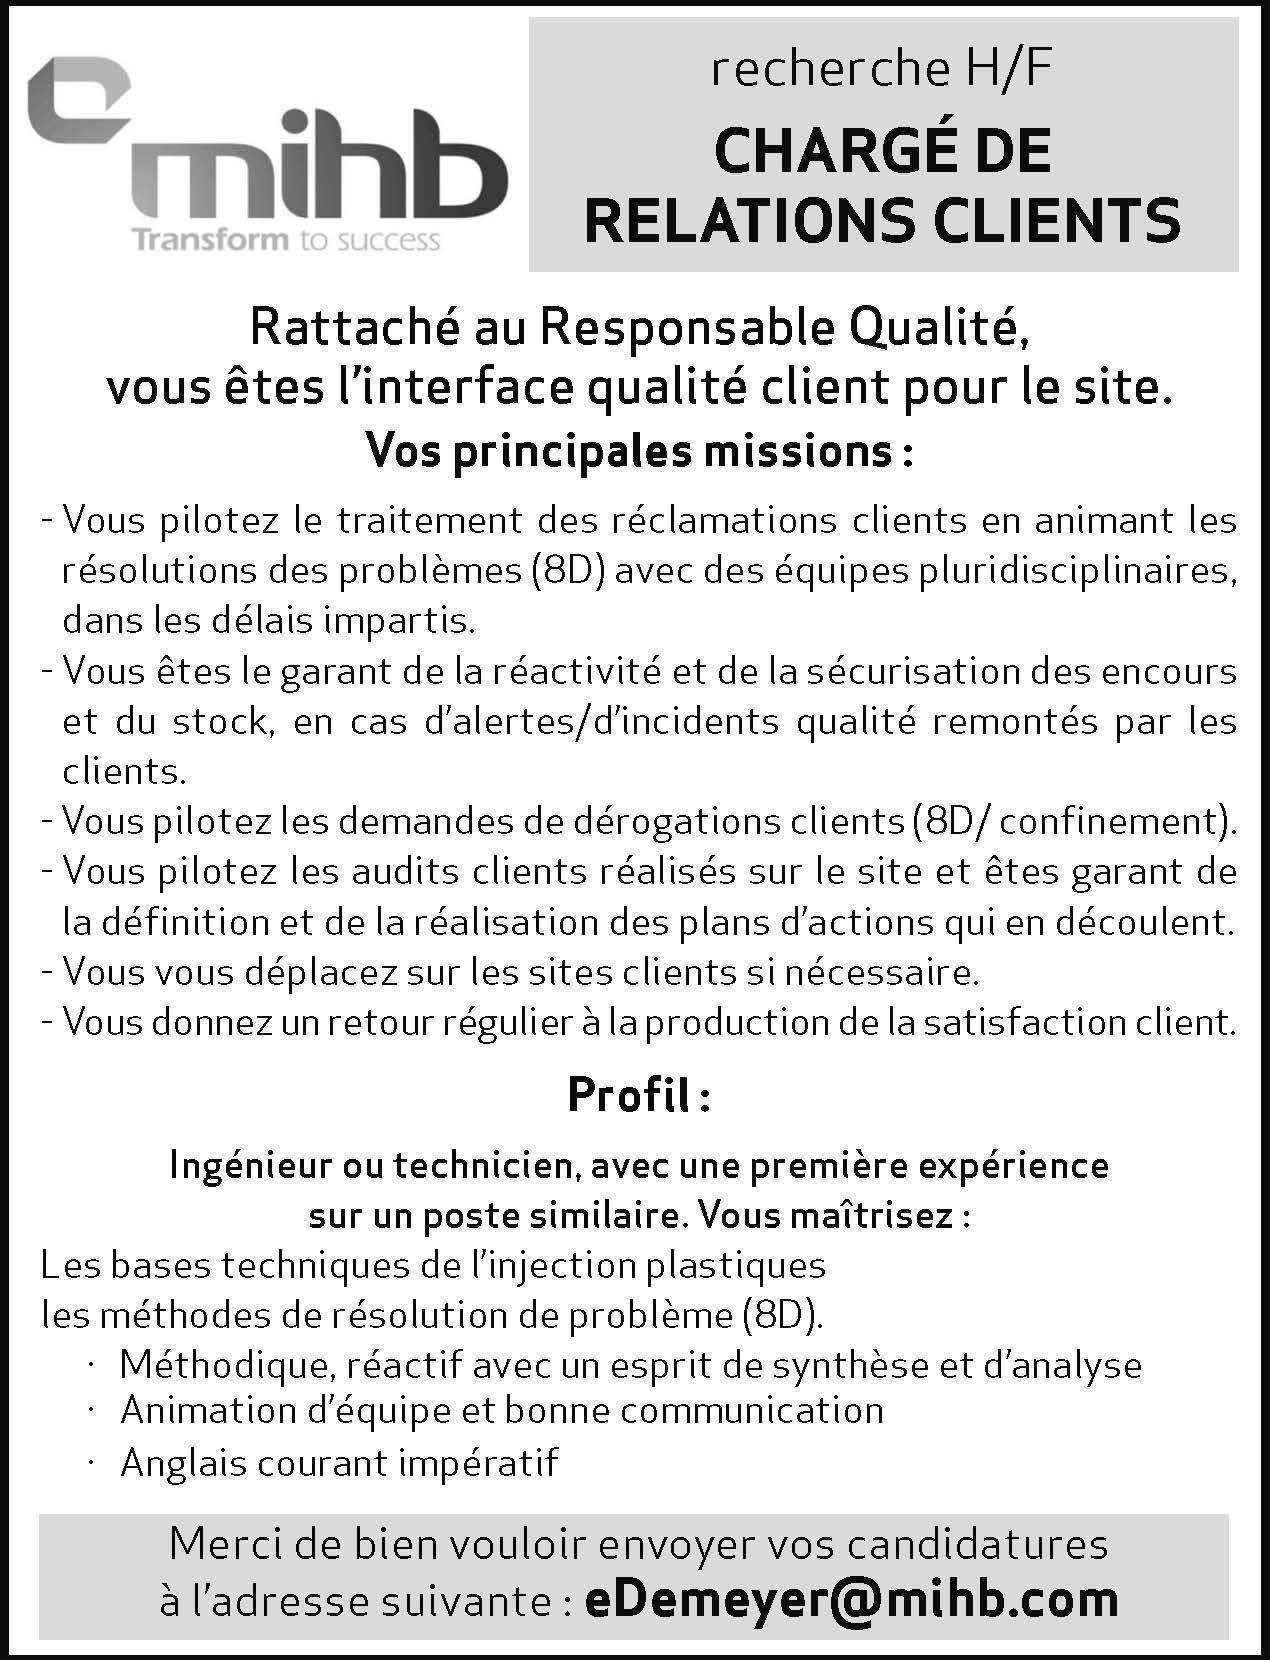 Rencontre Libertine Saint Nazaire (44600)